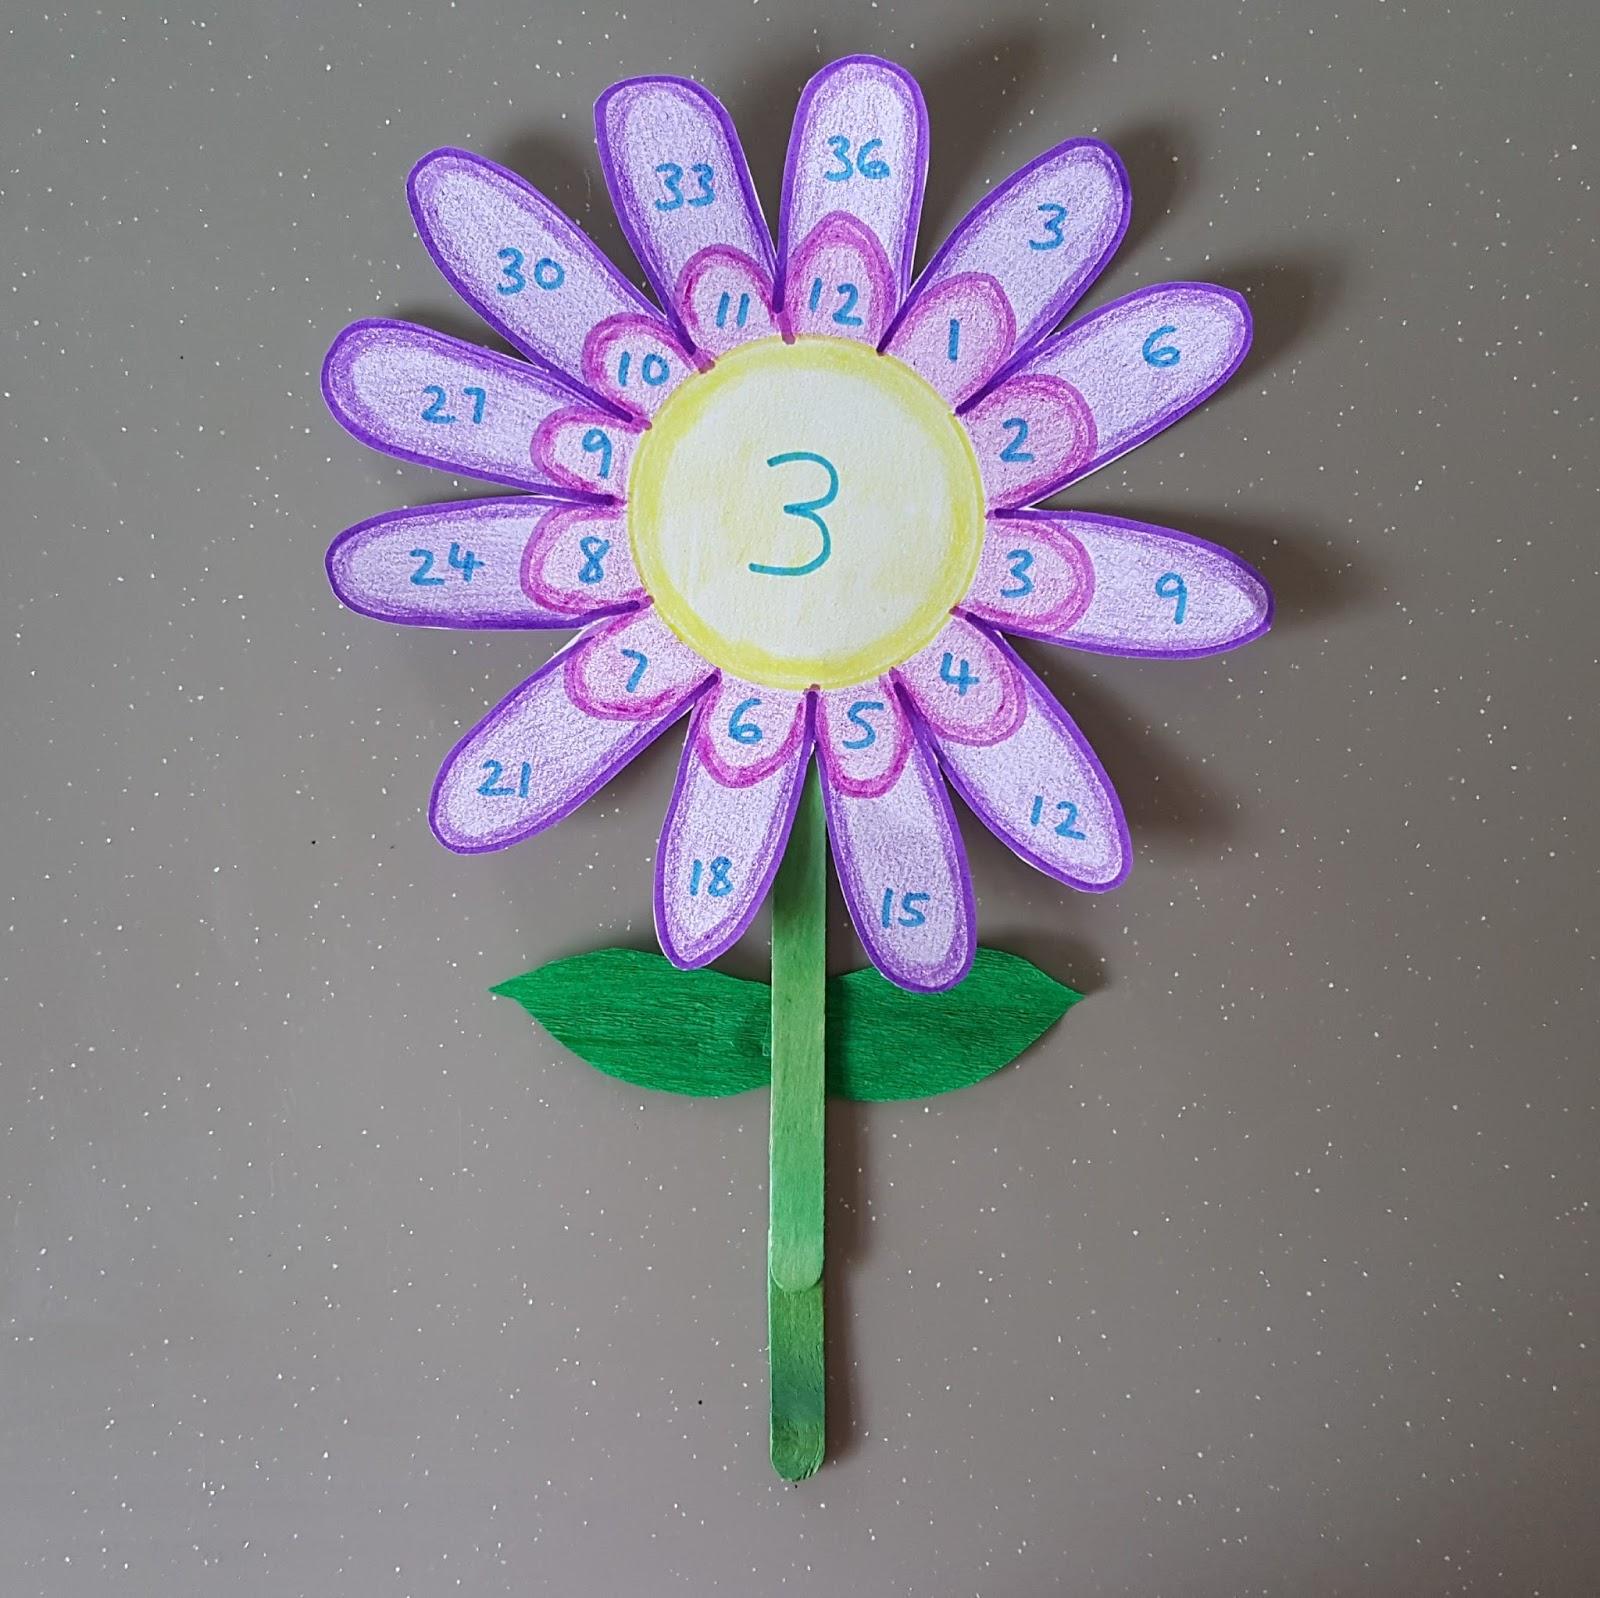 Waldorf Inspired Multiplication Crafts